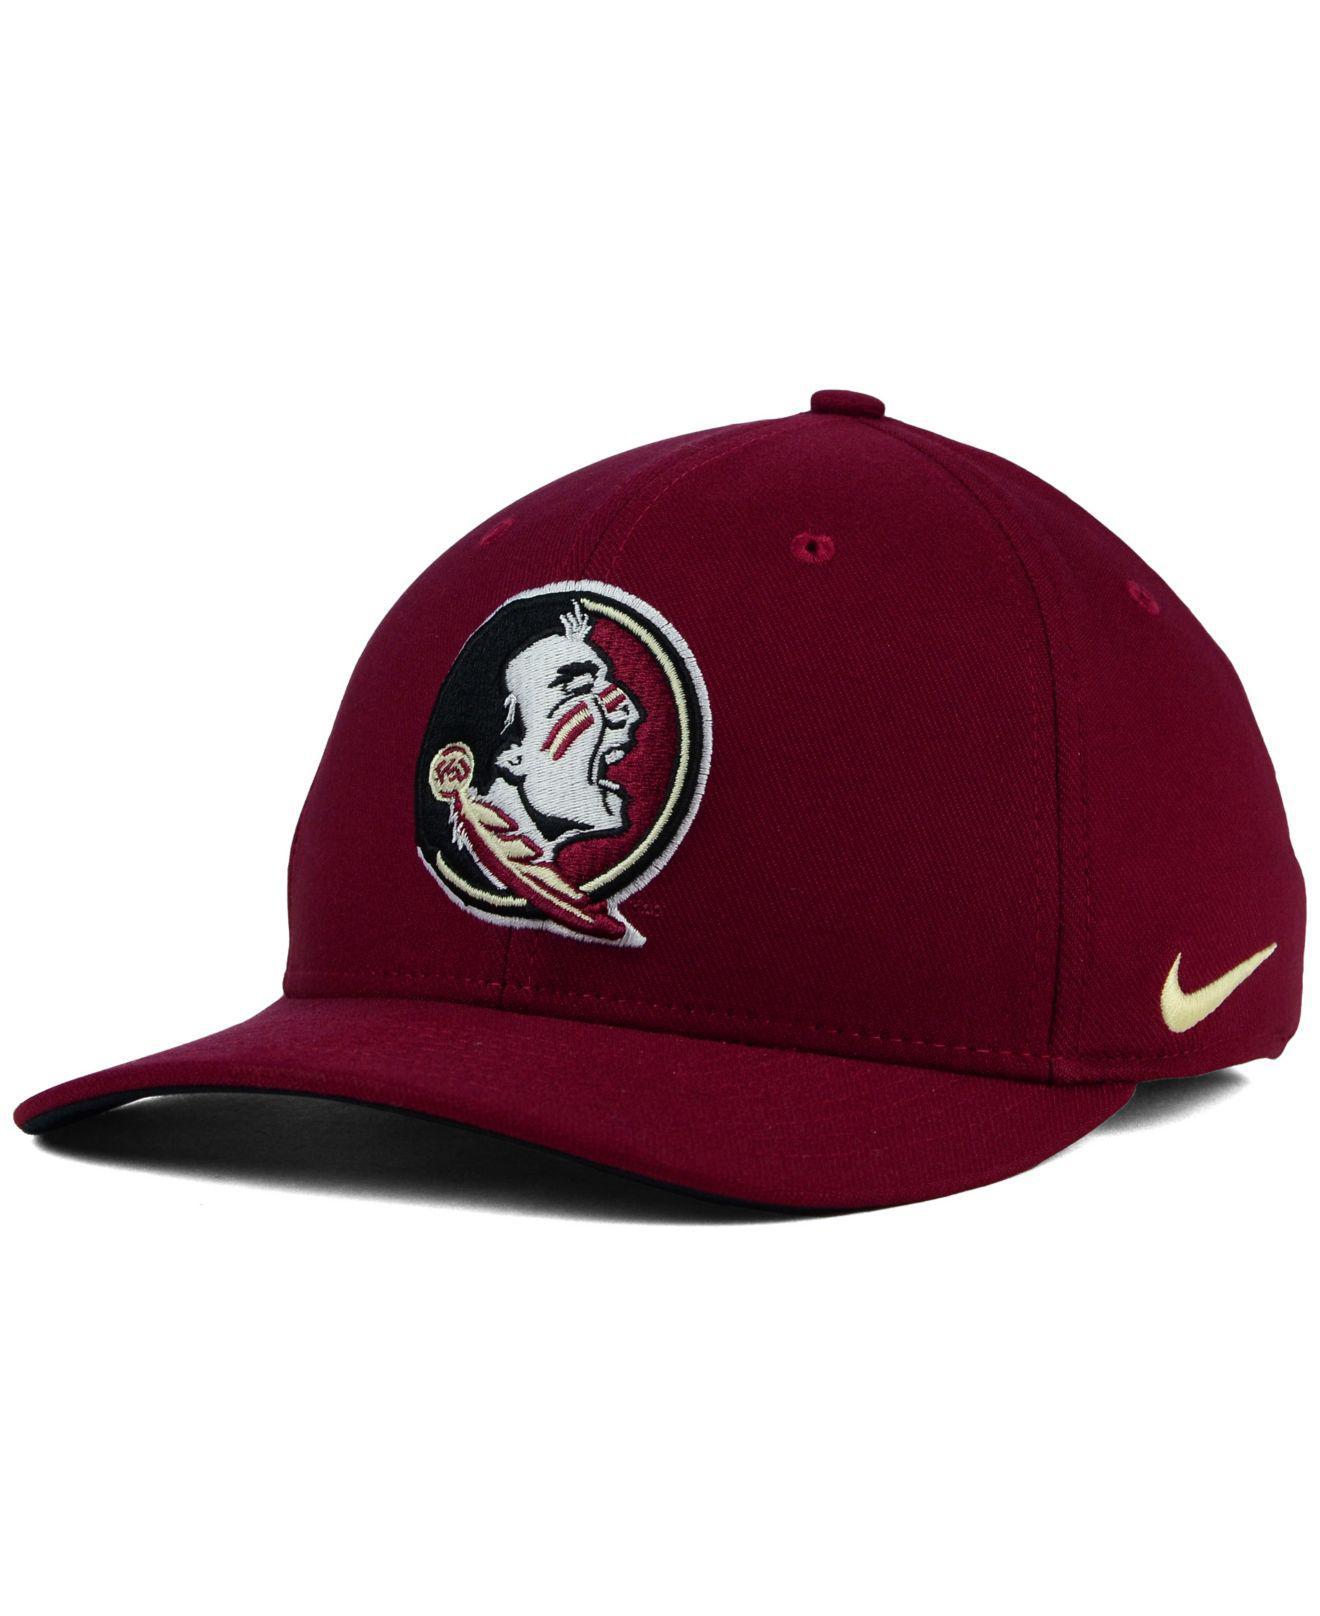 new style 72984 90cb9 Nike - Red Florida State Seminoles Classic Swoosh Cap for Men - Lyst. View  fullscreen